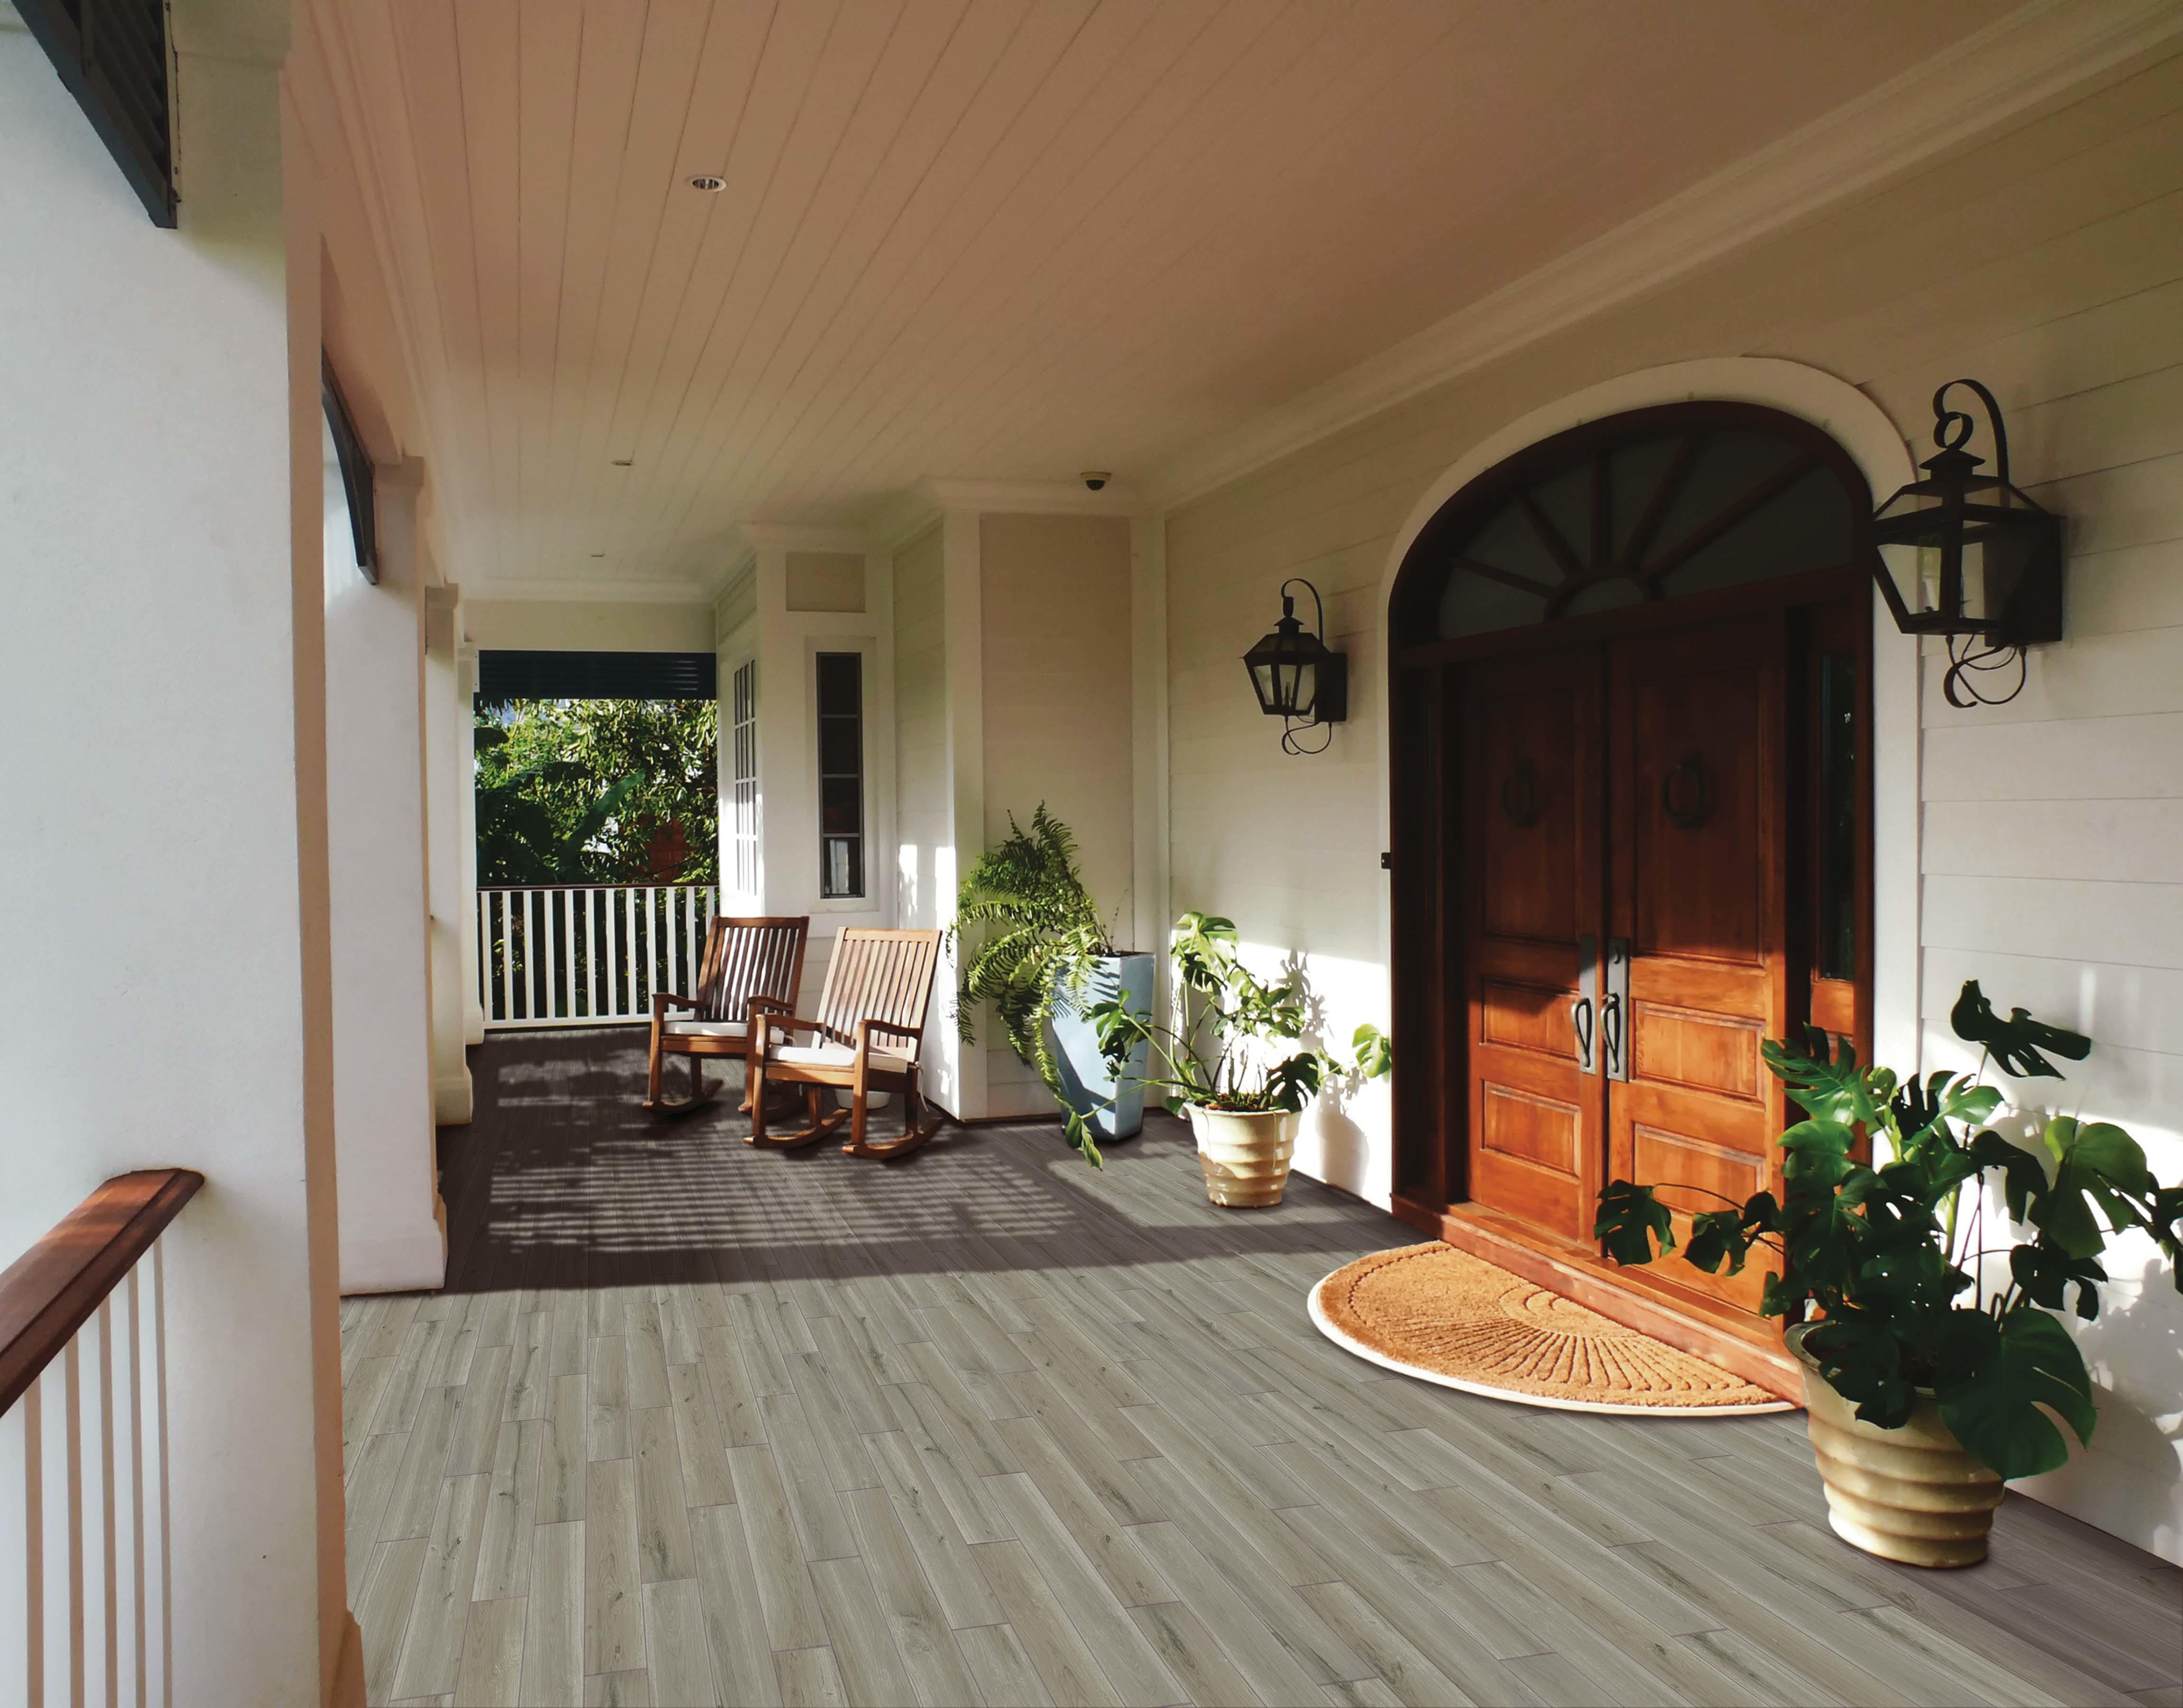 Milestone tile outlet in clarksville tn floors for Clarksville flooring